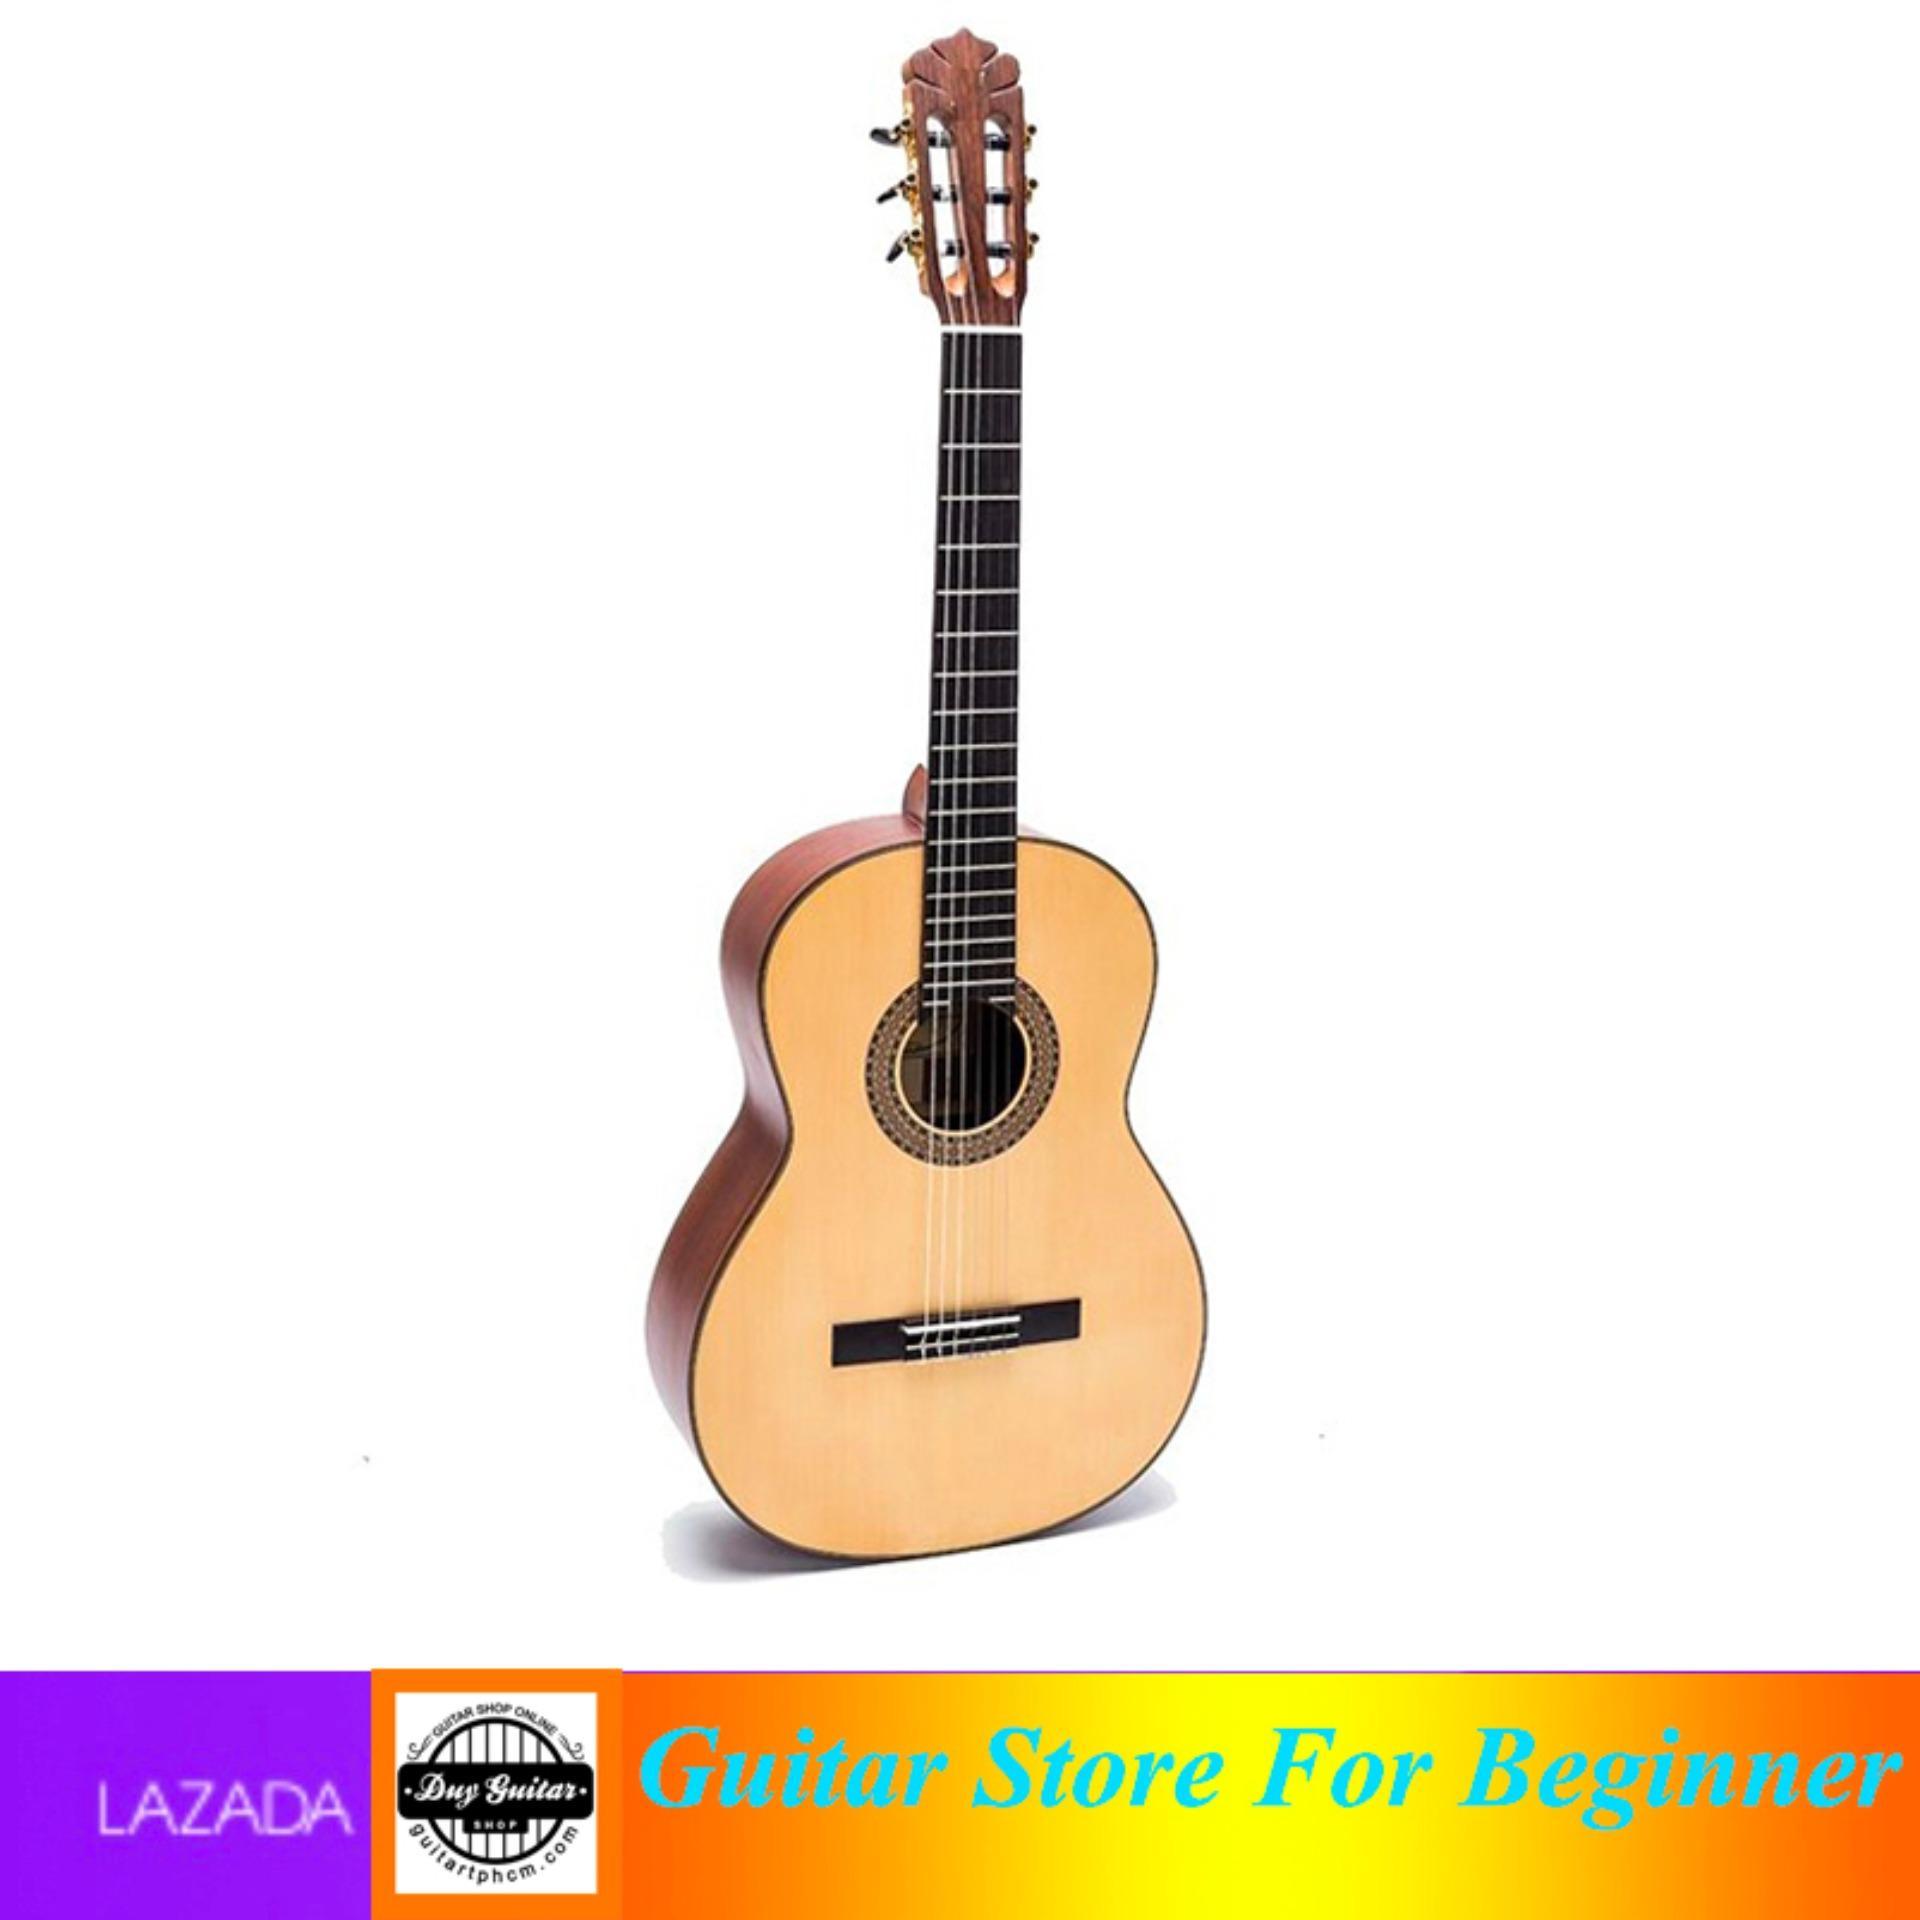 Đàn Guitar Classic guitar Việt Nam DC350 (gỗ) - Shop Duy Guitar